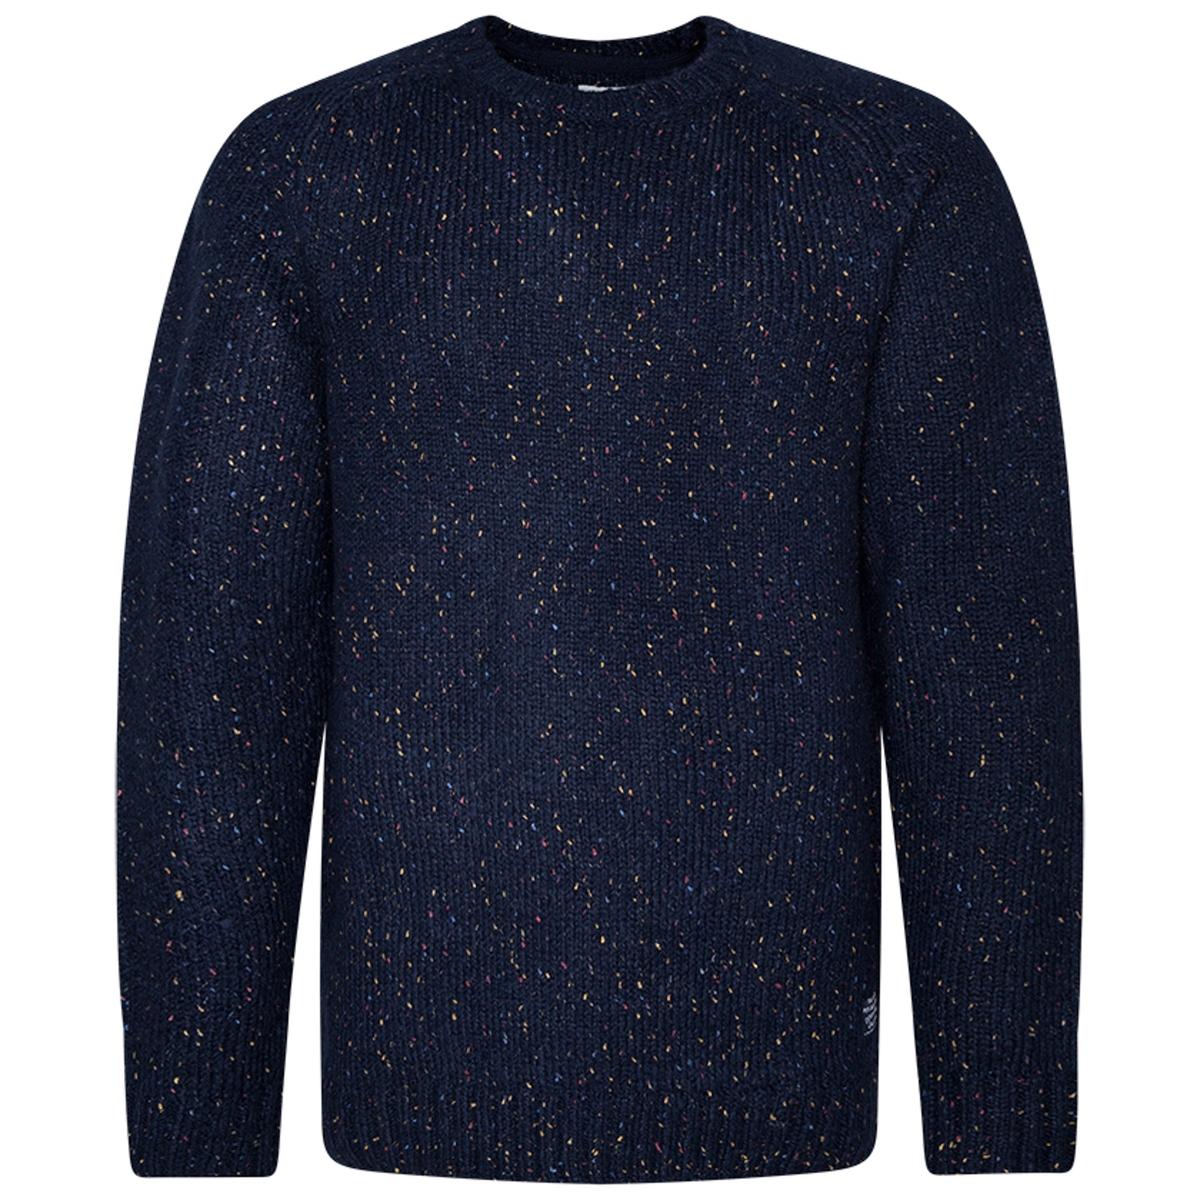 Пуловер La Redoute Из хлопка и альпаки Denis S синий цена и фото